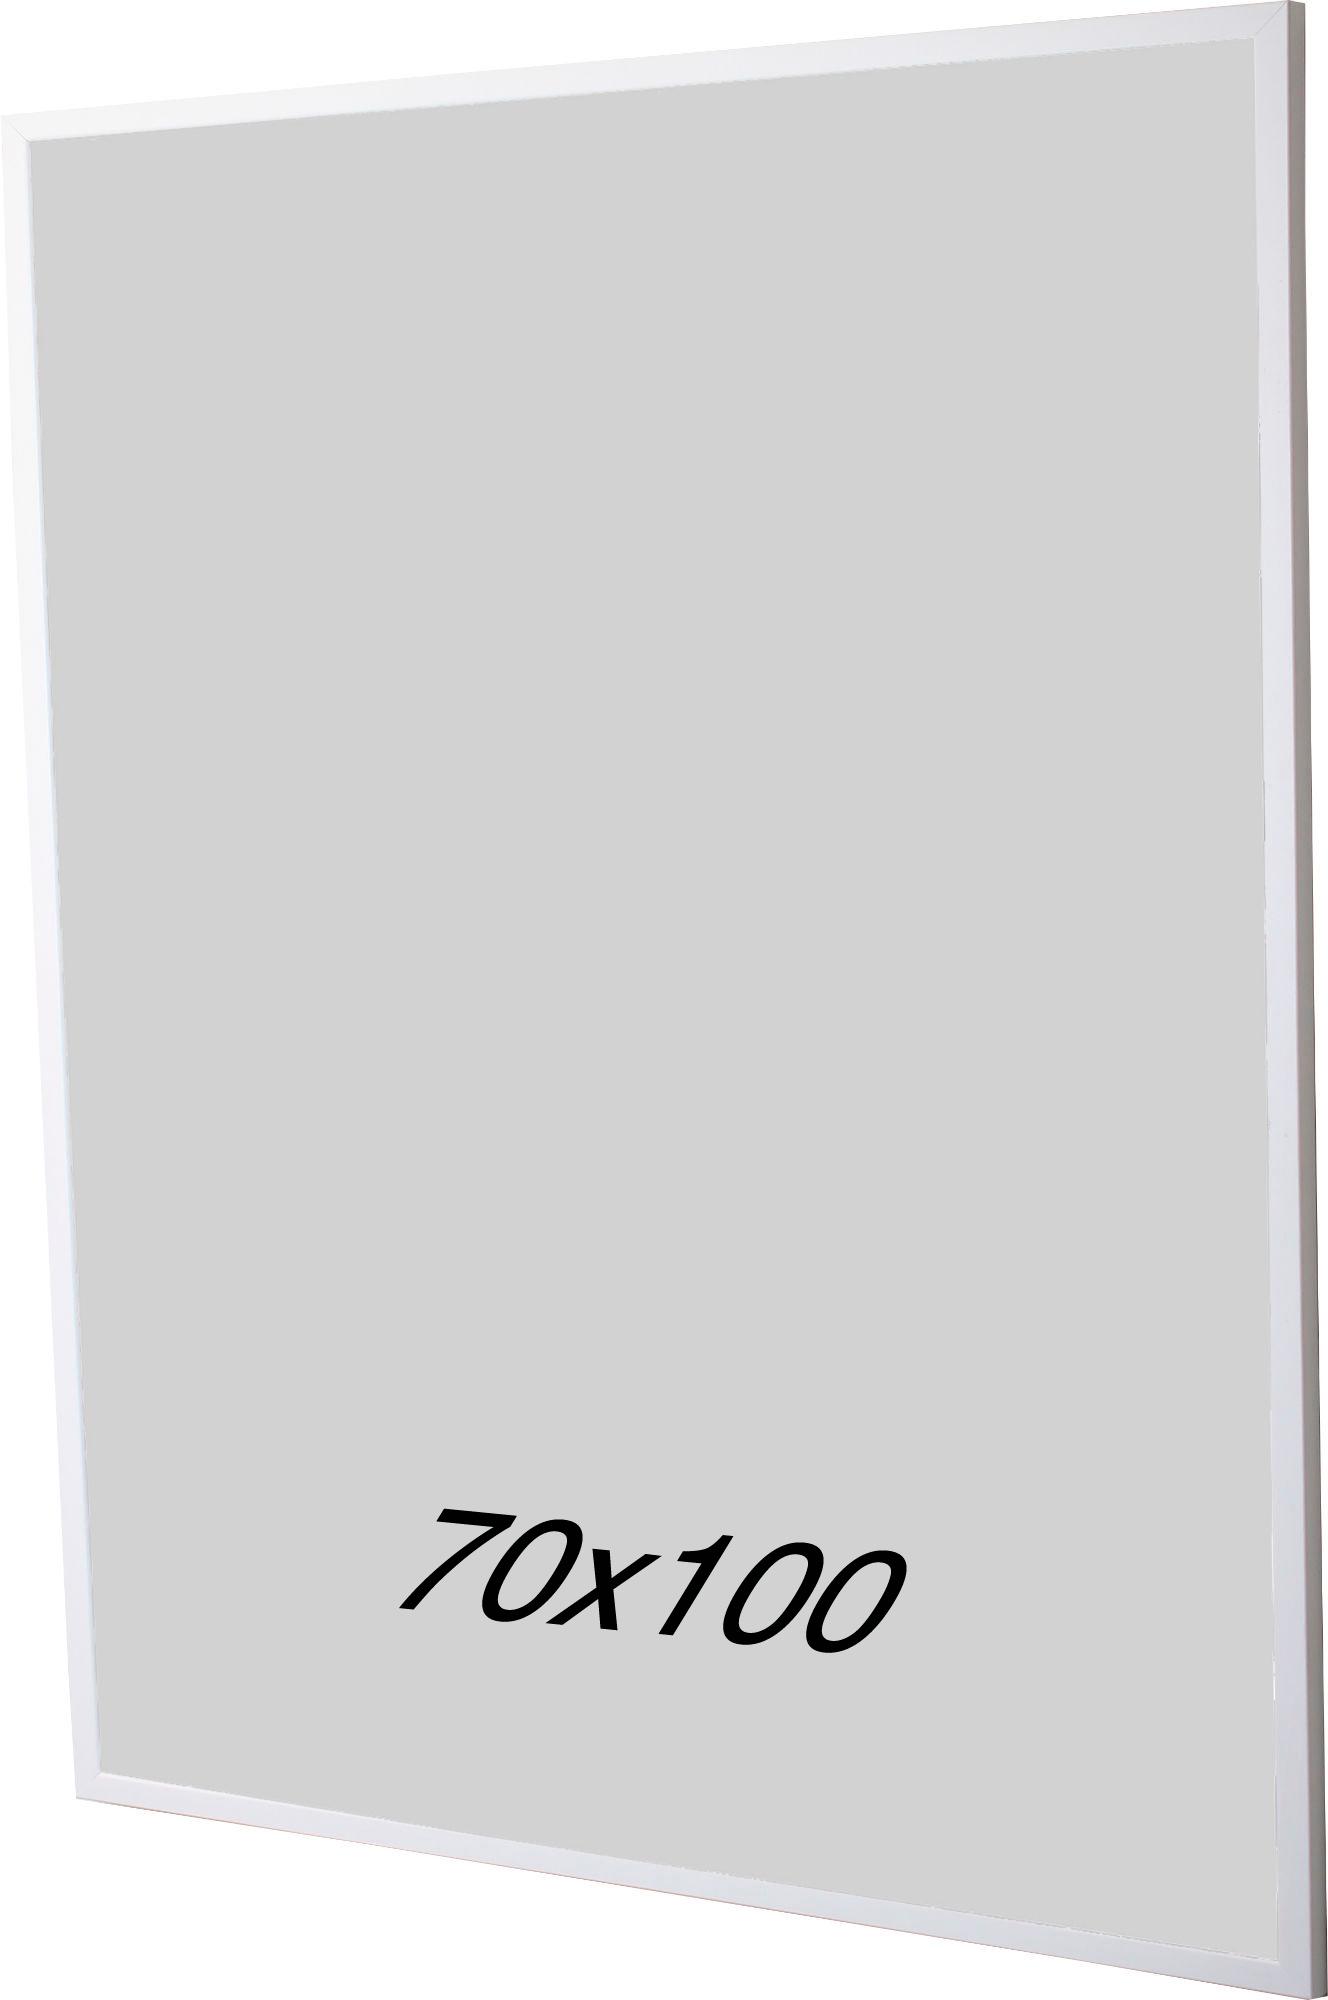 Stilren Plexi -kehys 70x100 cm